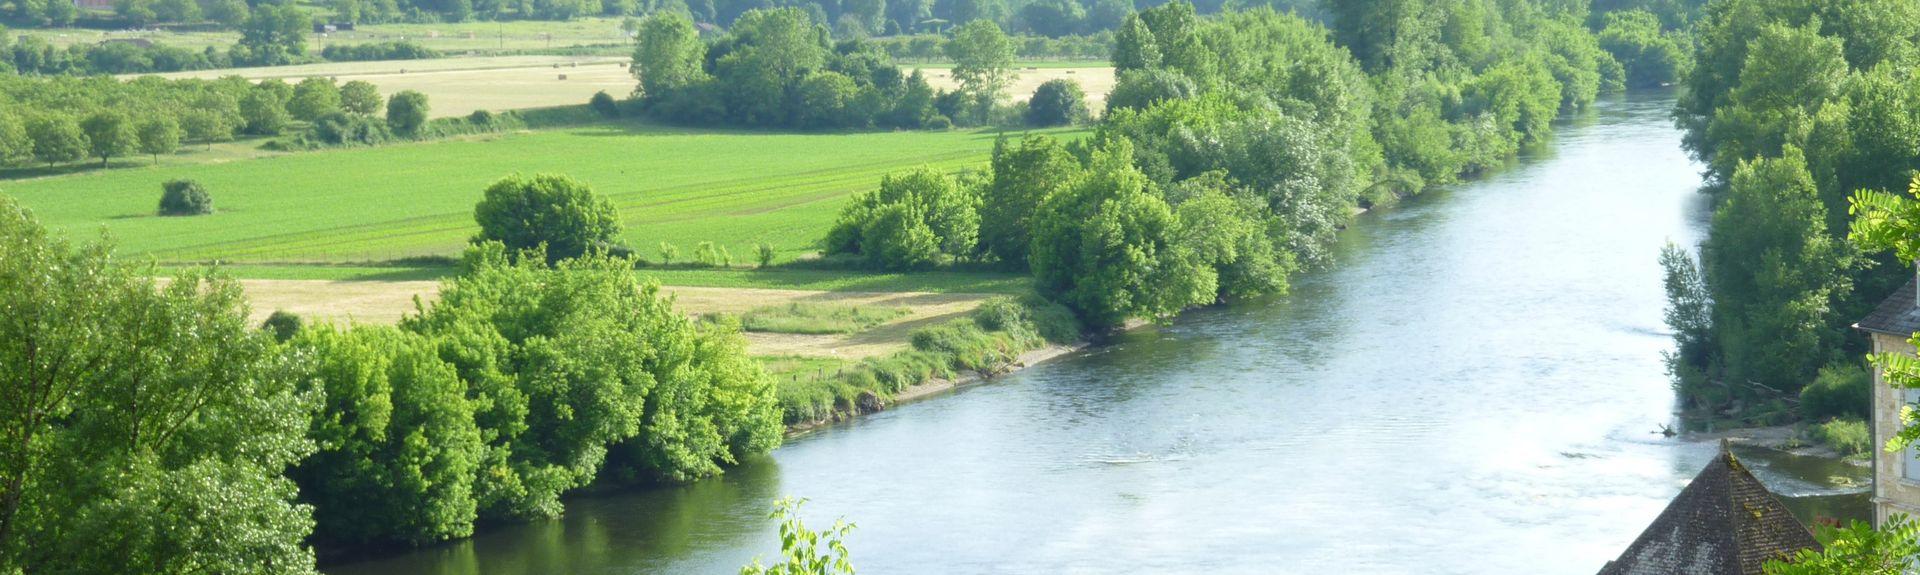 Groléjac, Dordogne, Frankreich